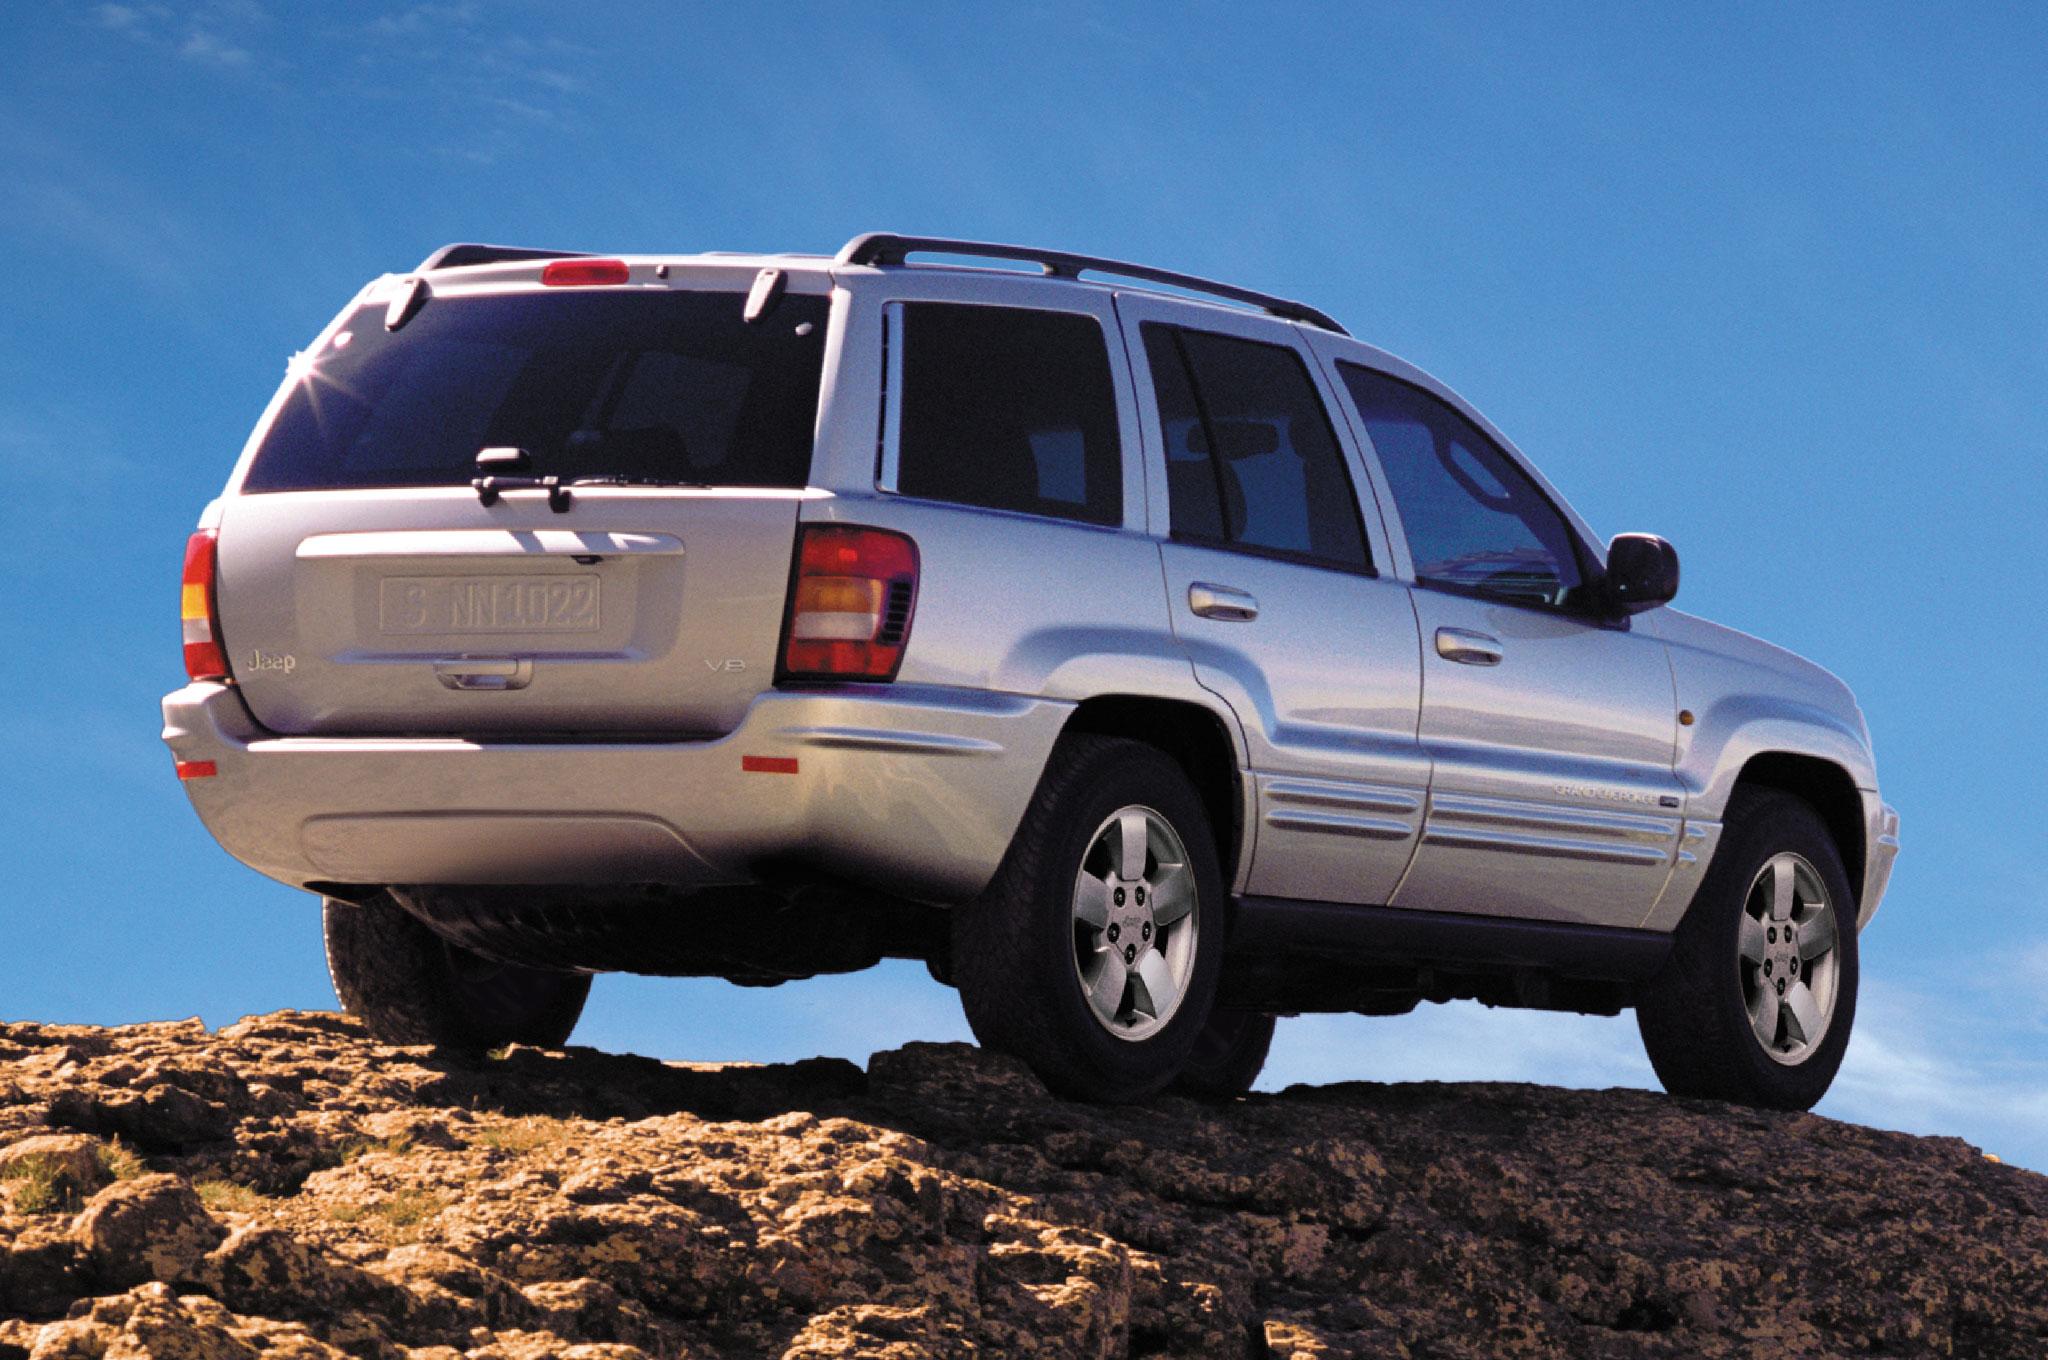 2004 Jeep Grand Cherokee Rear View11